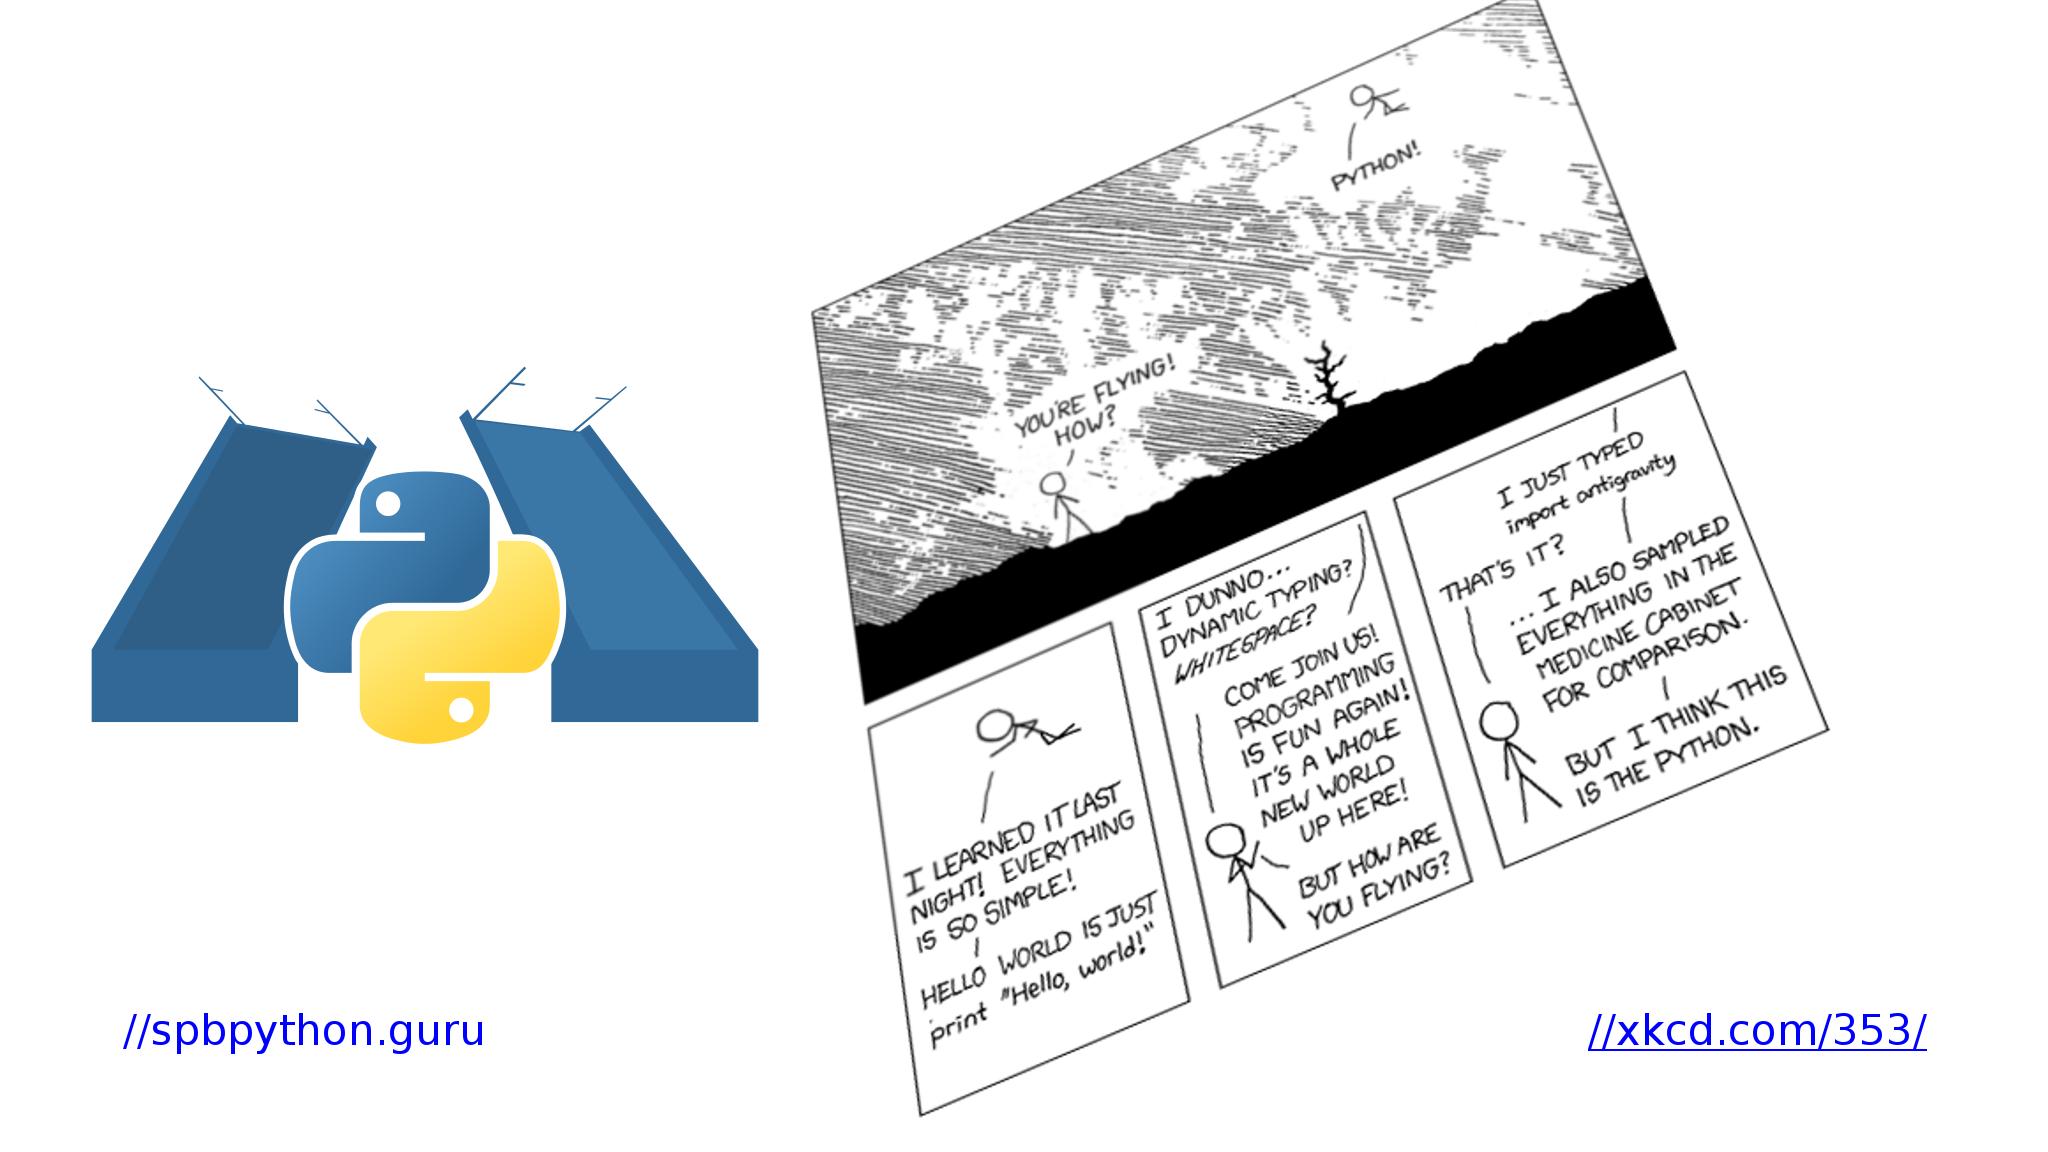 SPb Python Interest Group | Teespring